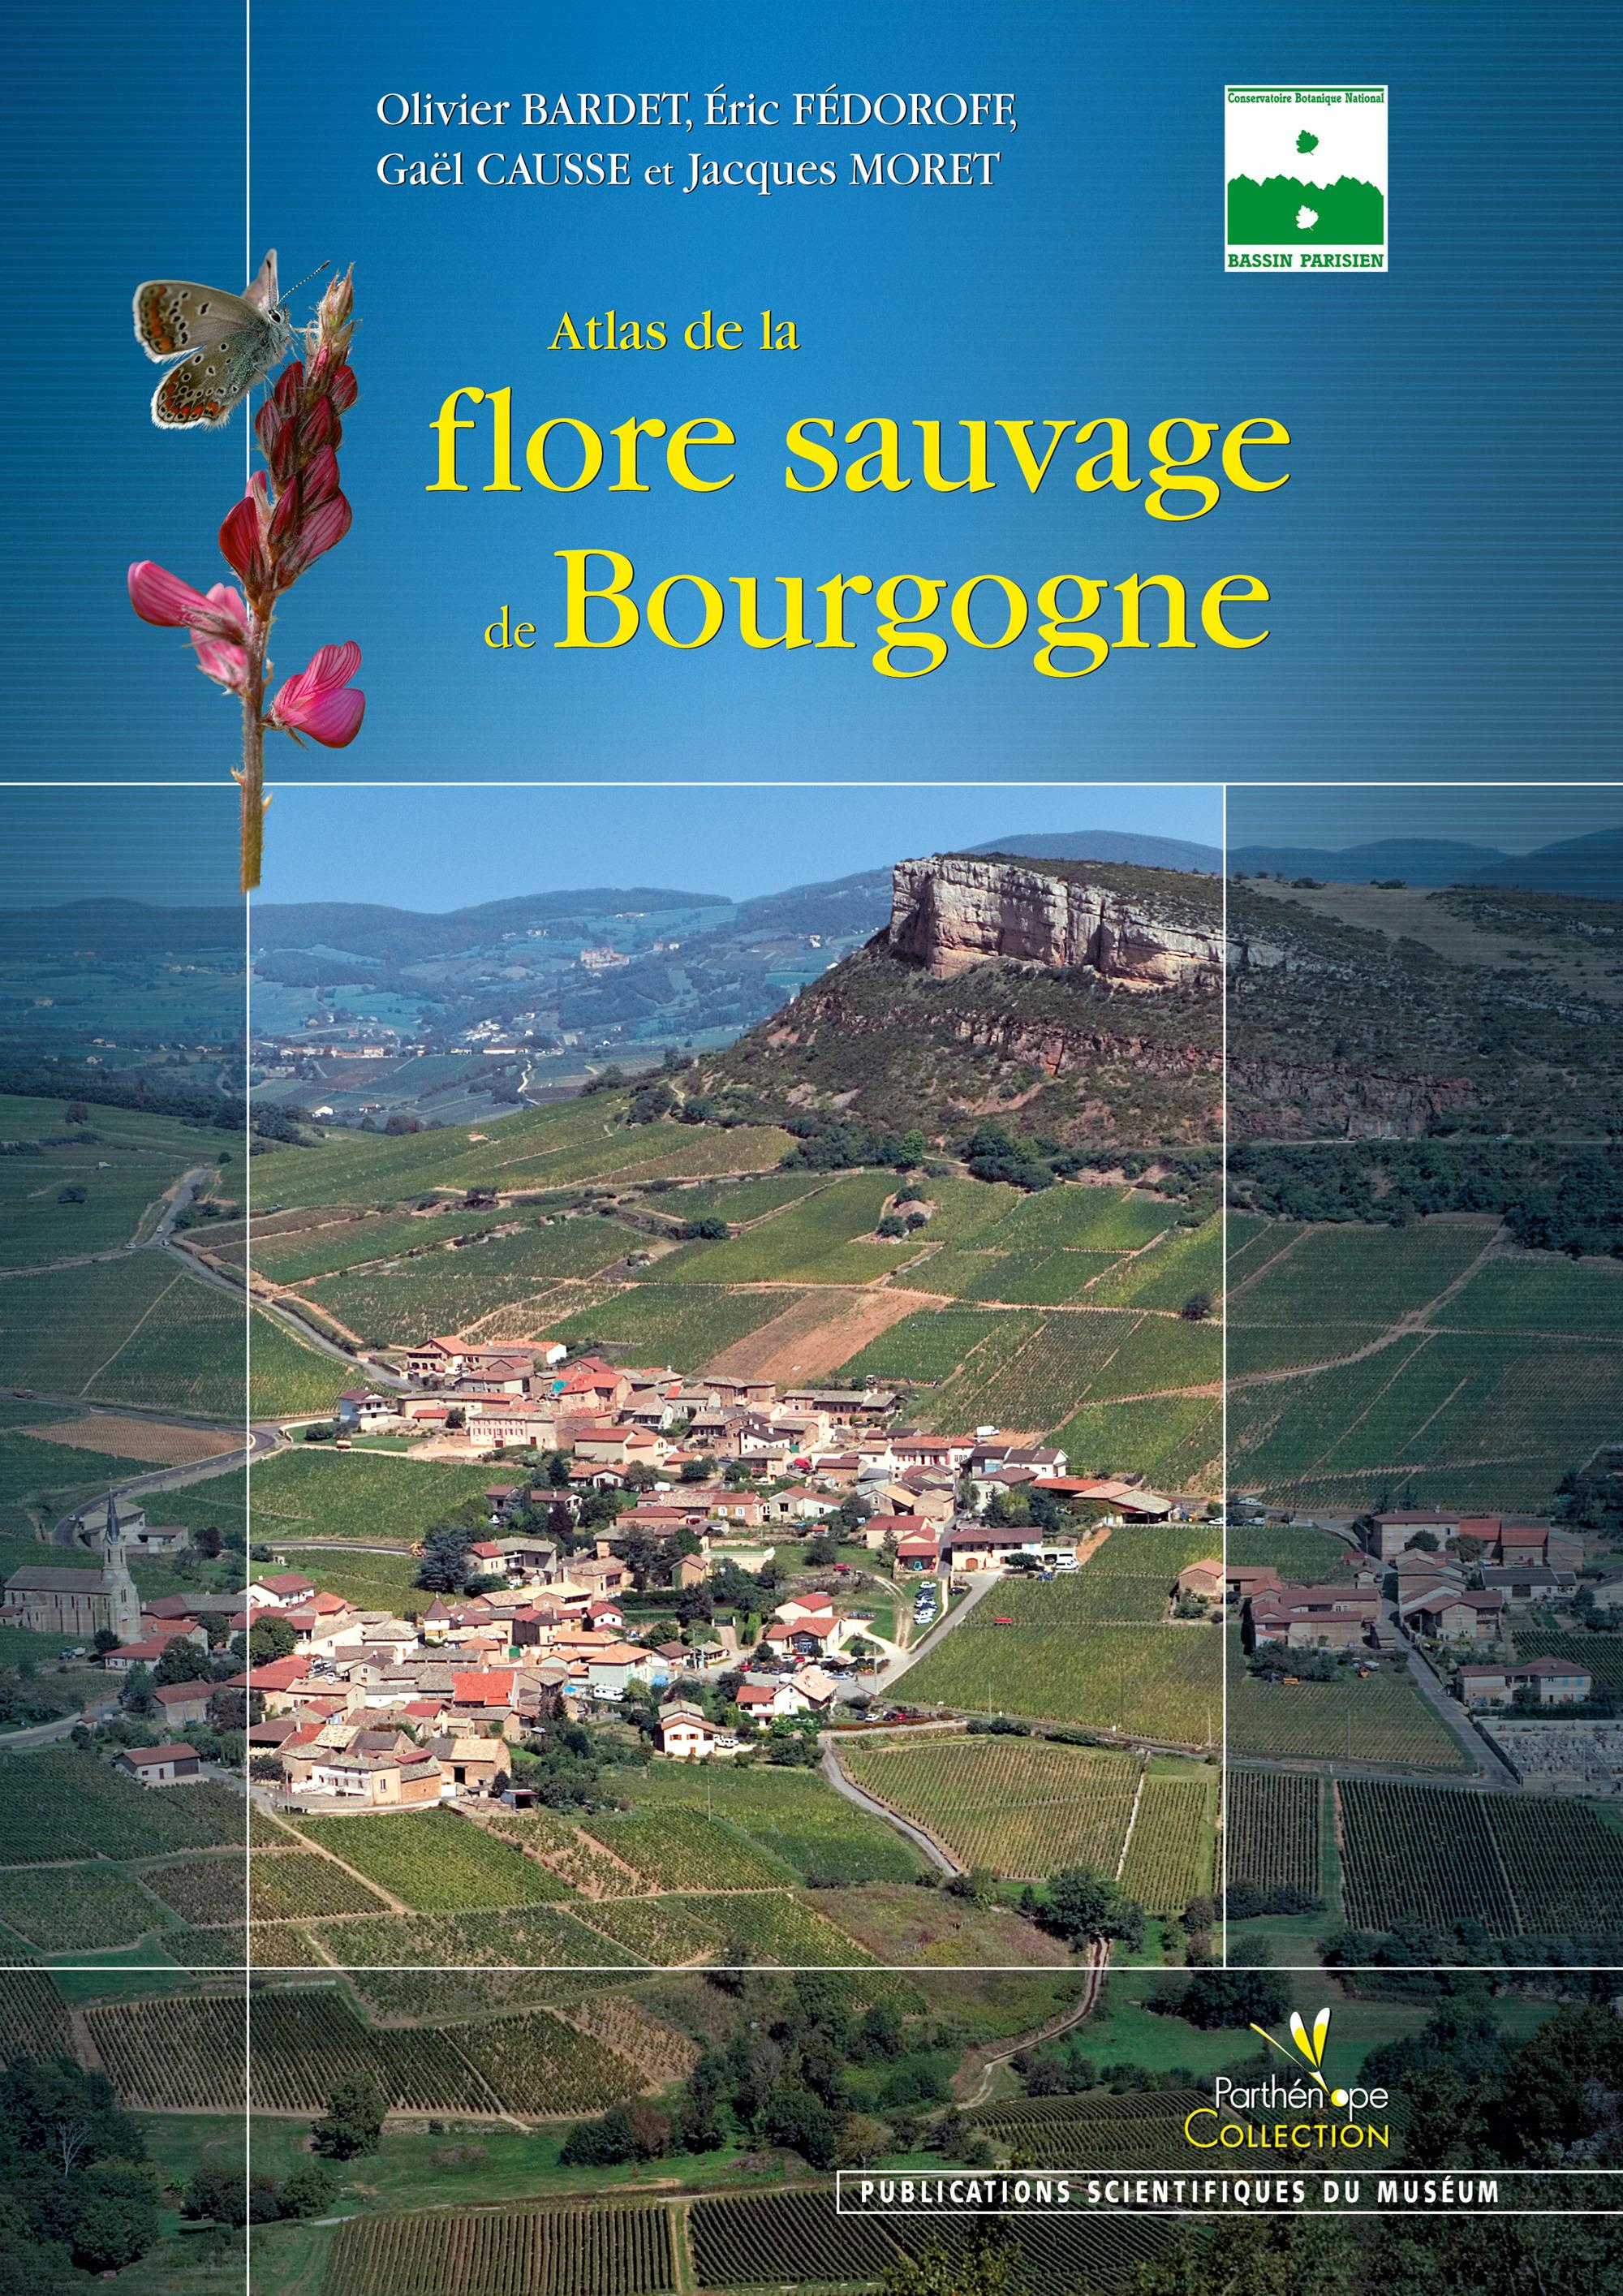 Olivier Barde Atlas de la flore sauvage de Bourgogne